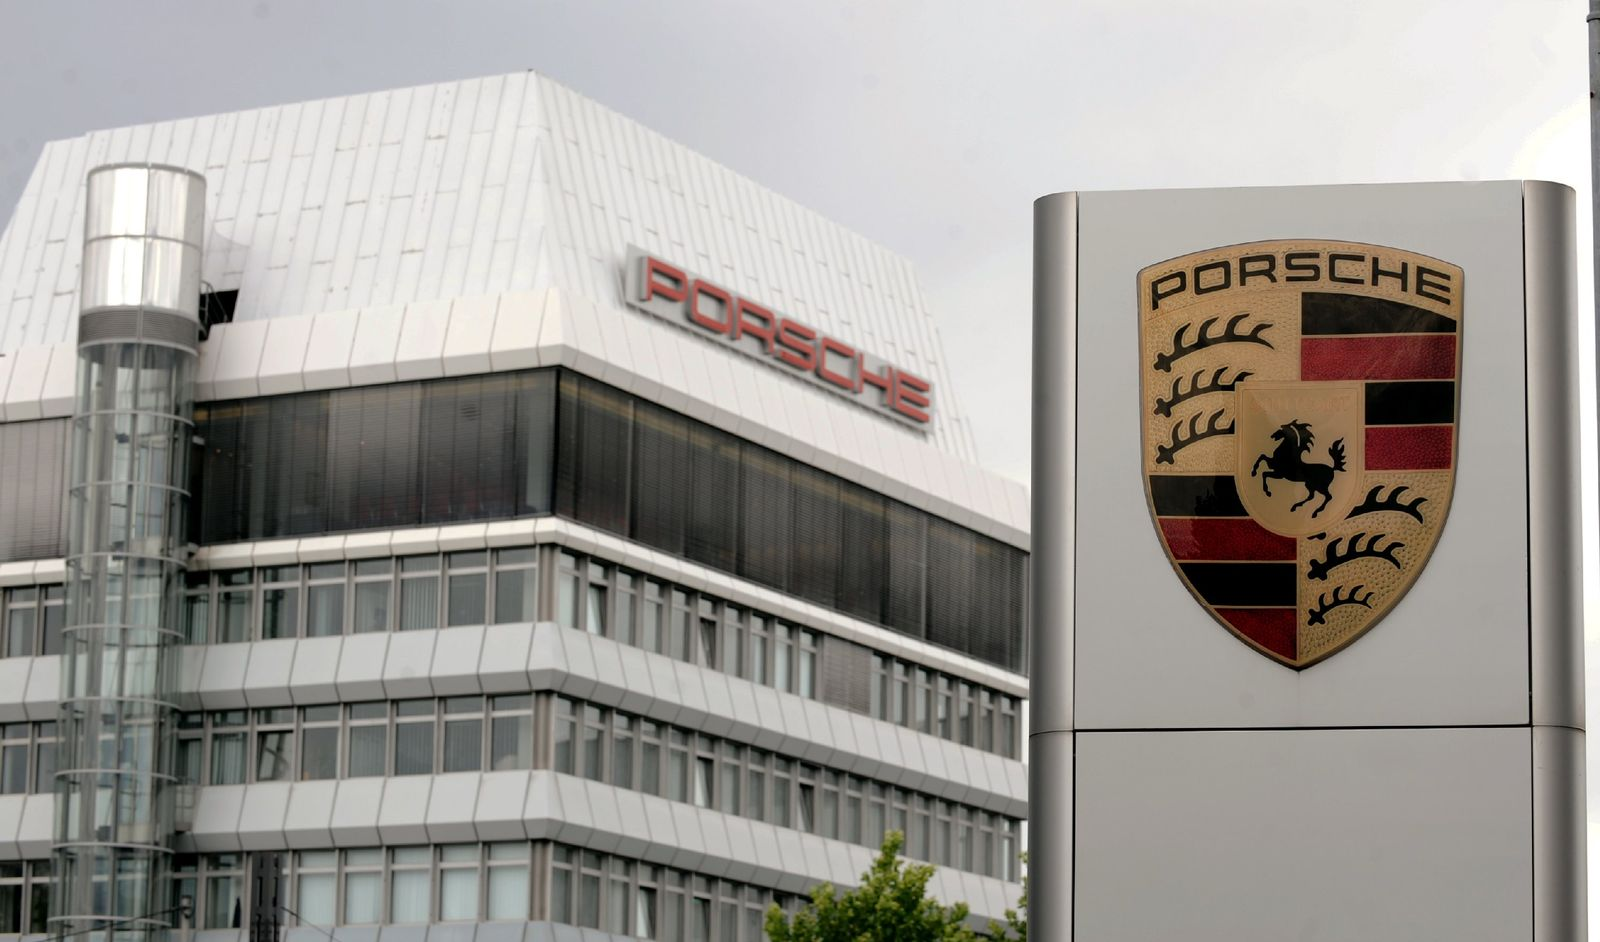 Porsche-Zentrale in Stuttgart Zuffenhausen